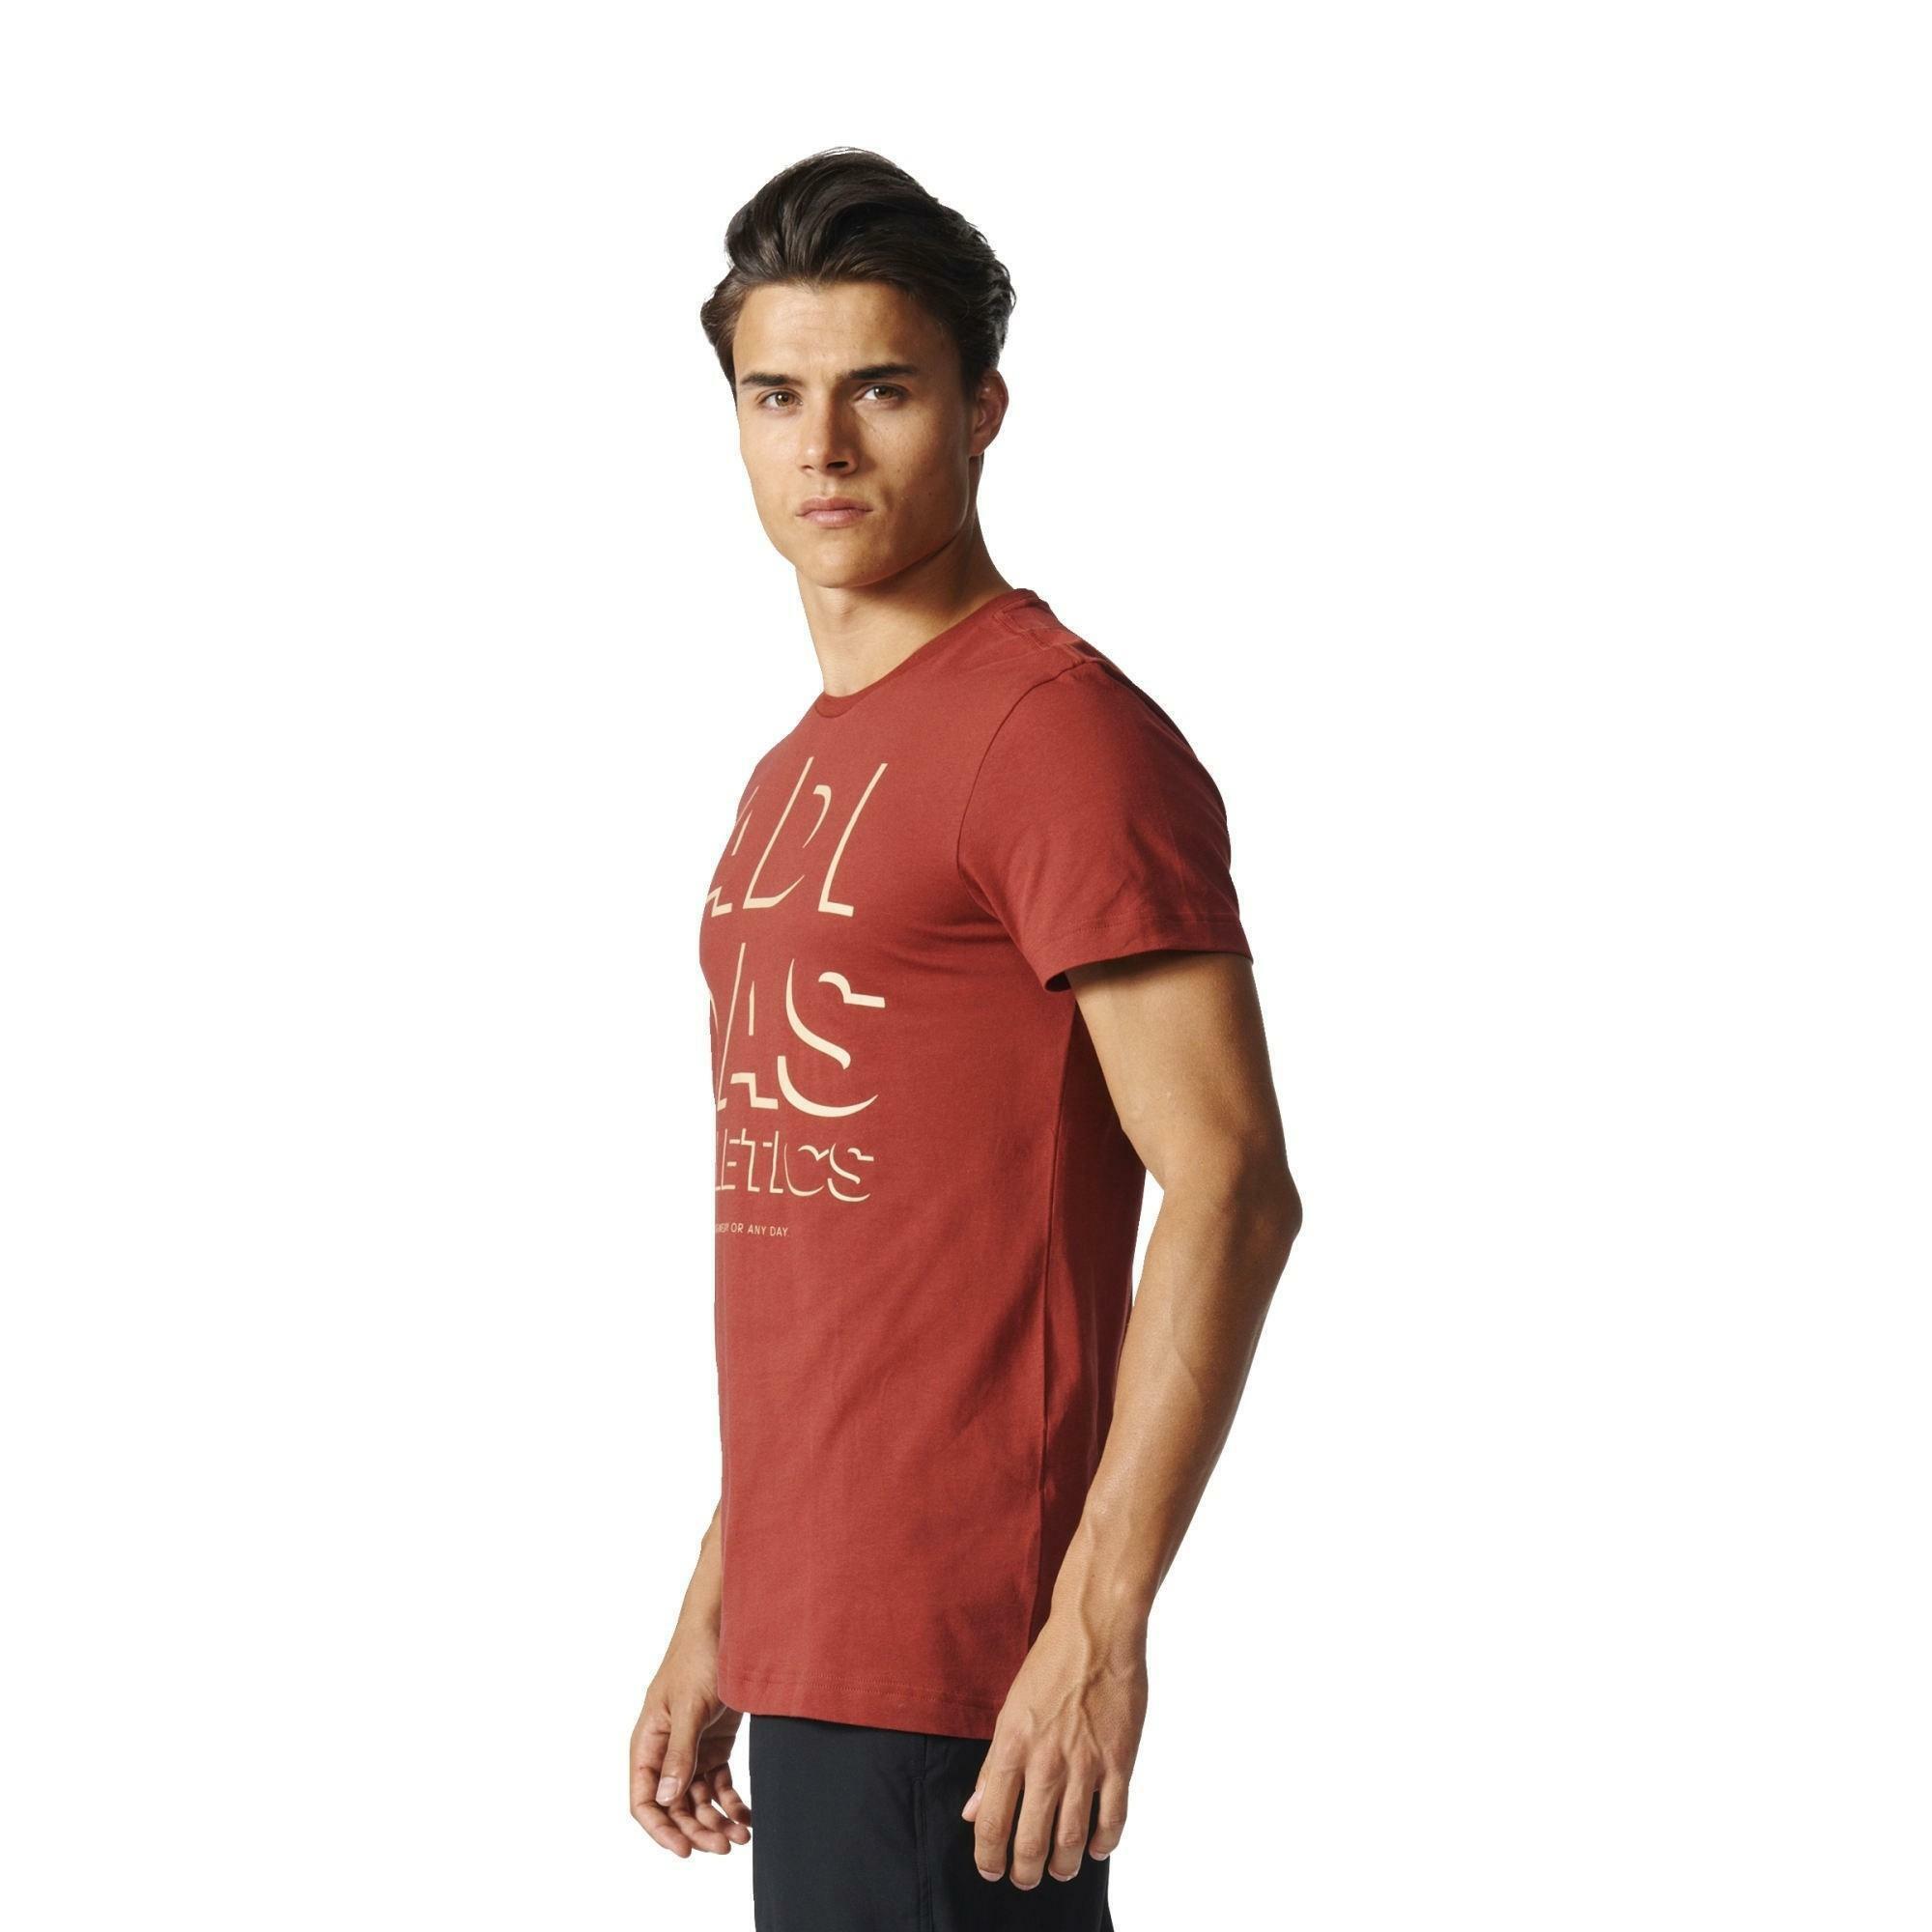 adidas adidas athletics t-shirt uomo rossa b45734